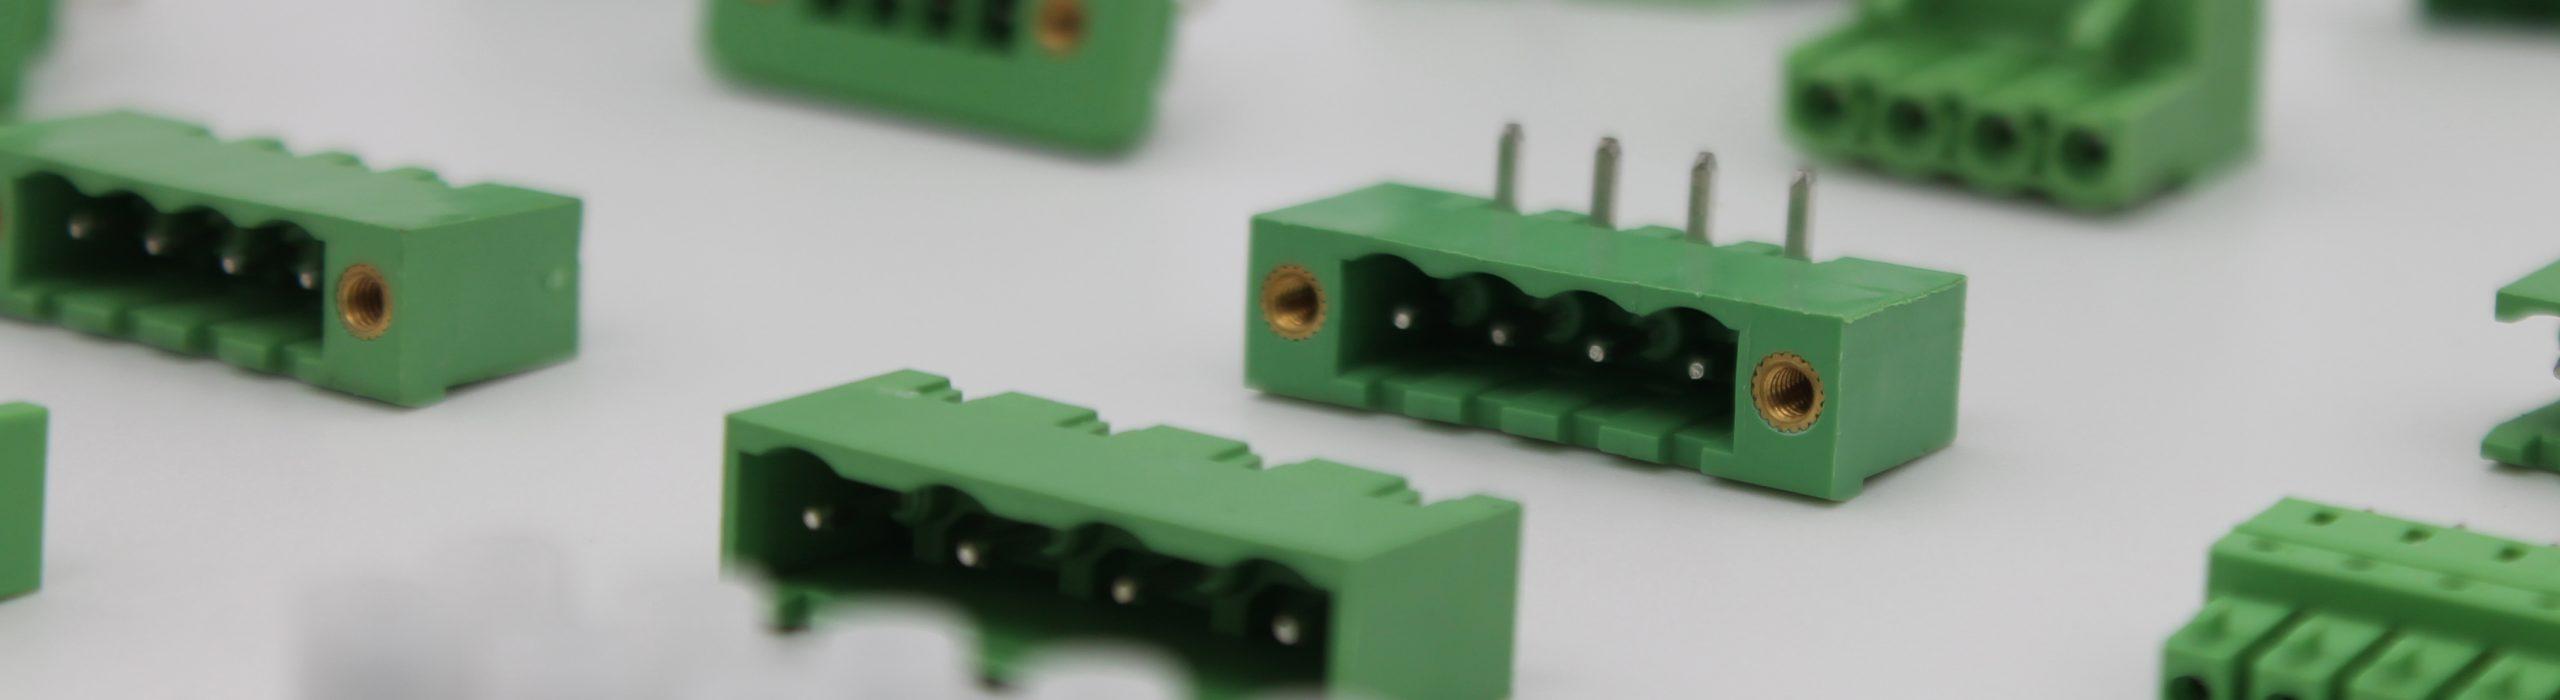 PCB Pluggable Terminal Blocks